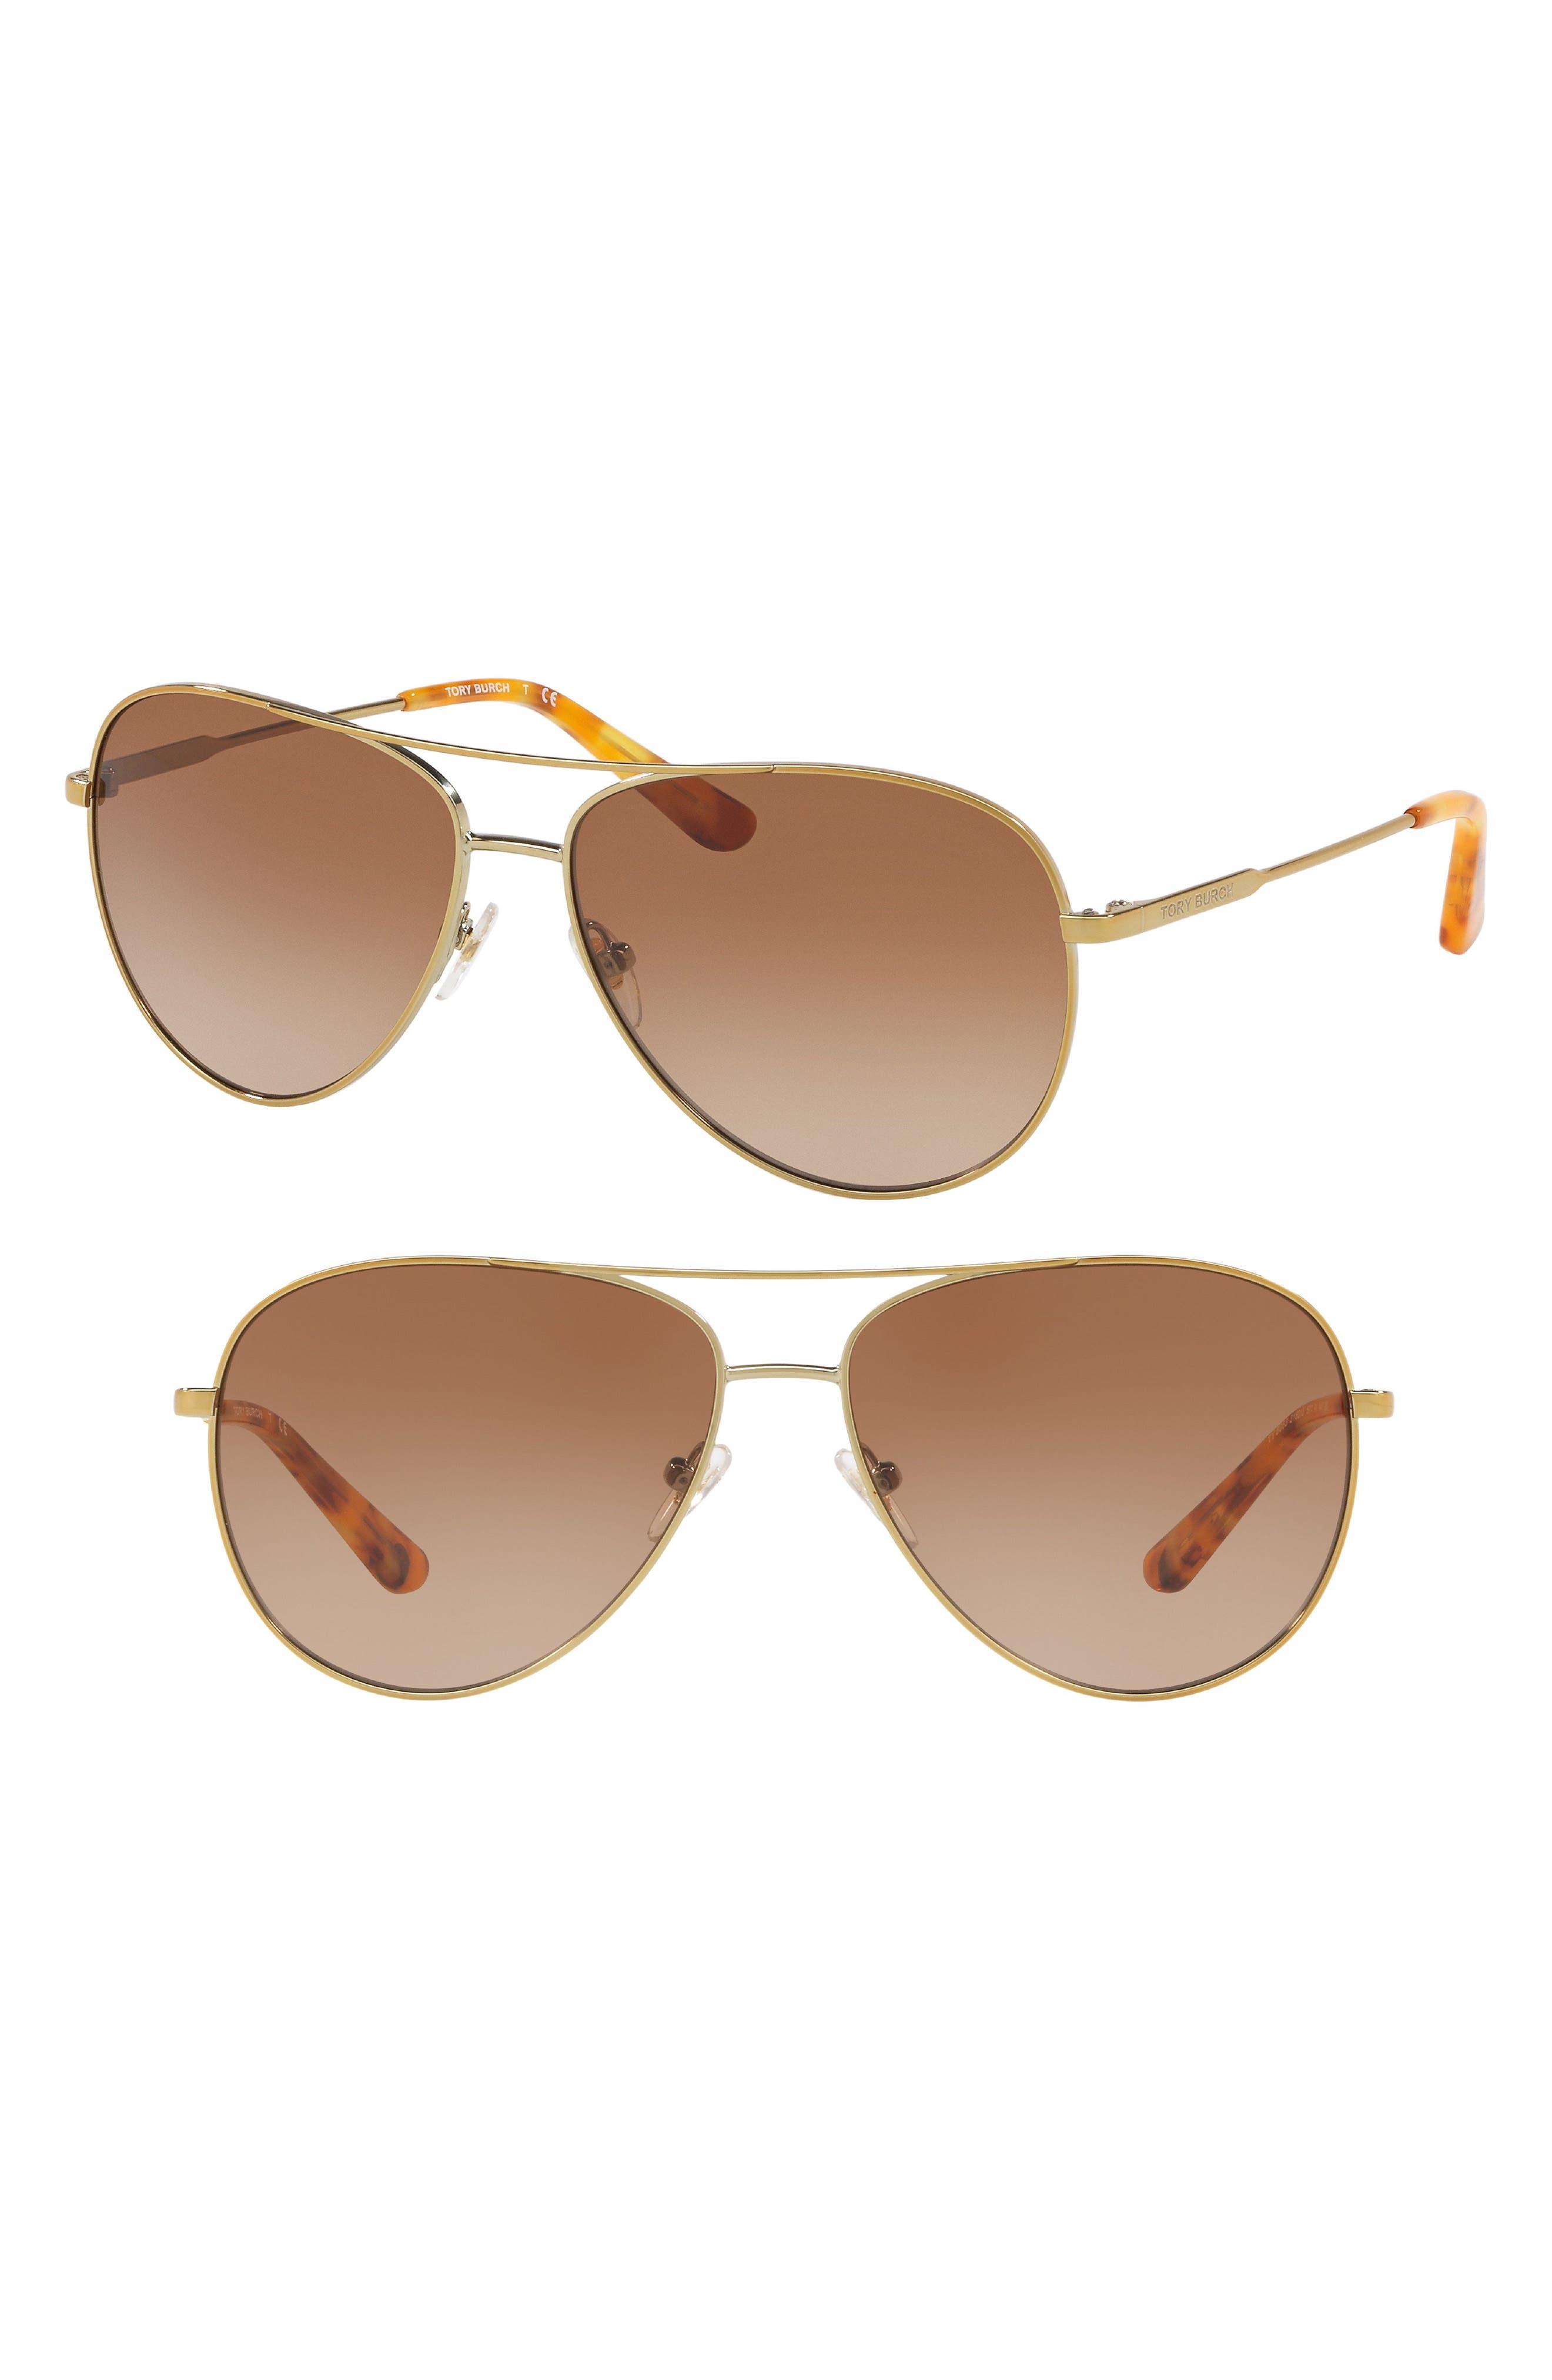 TORY BURCH, 59mm Metal Aviator Sunglasses, Alternate thumbnail 2, color, 710